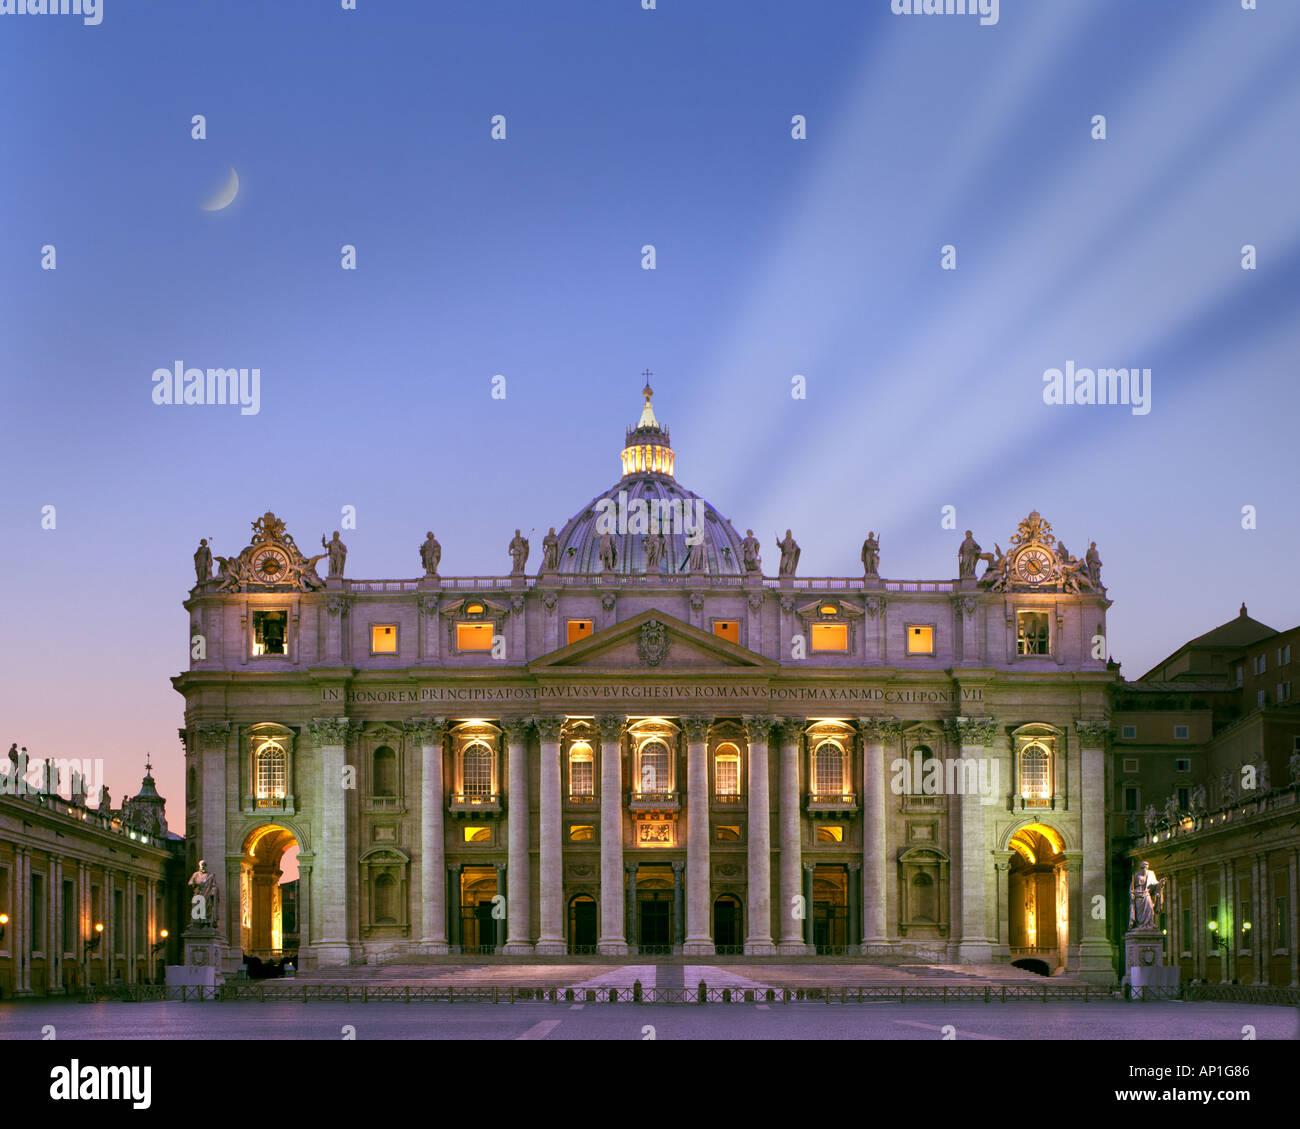 - Roma: la basílica de San Pedro por la noche Imagen De Stock